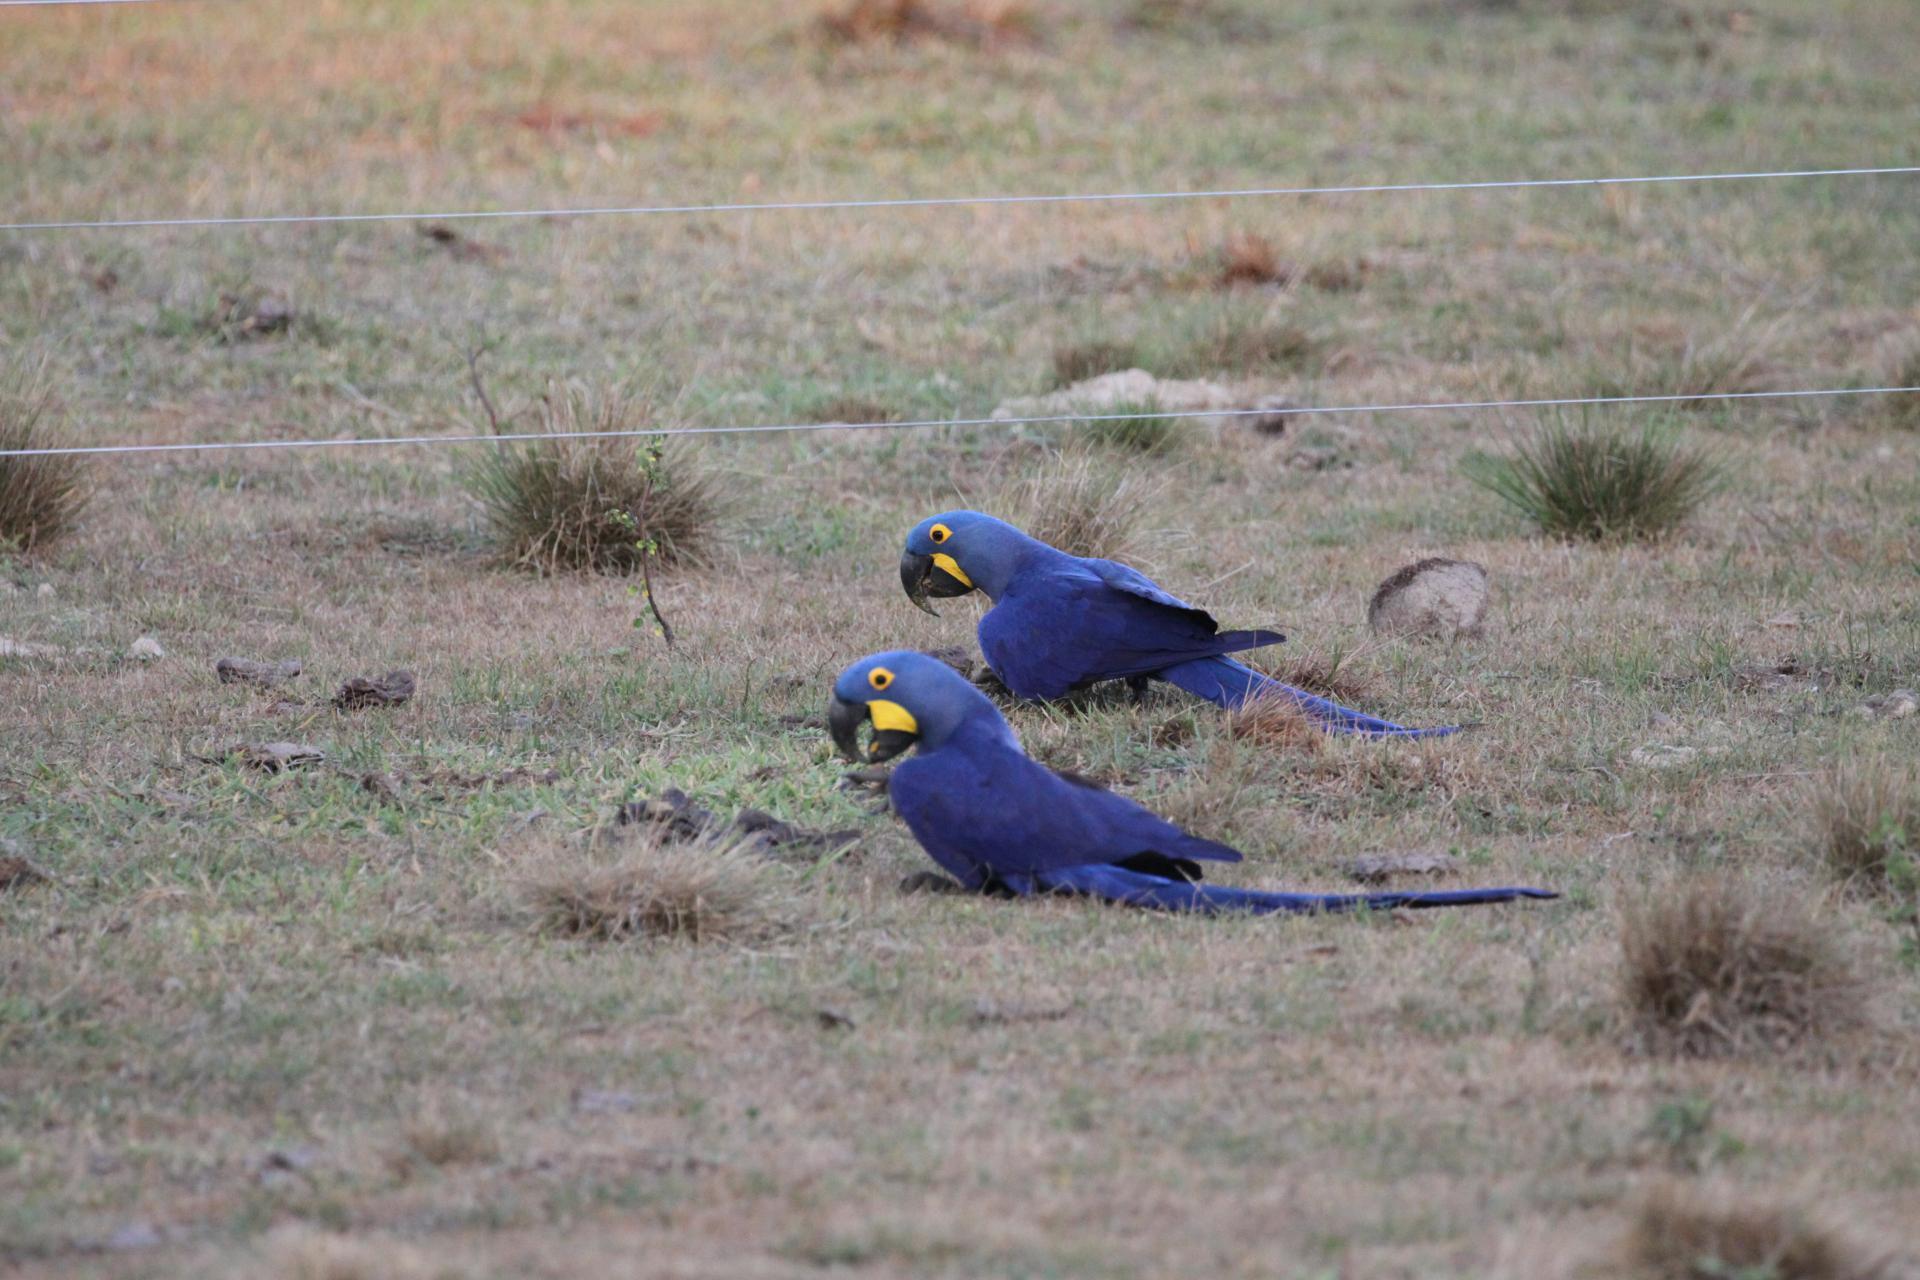 Zwei Hyazinth-Aras auf dem Grasboden im Süd-Pantanal